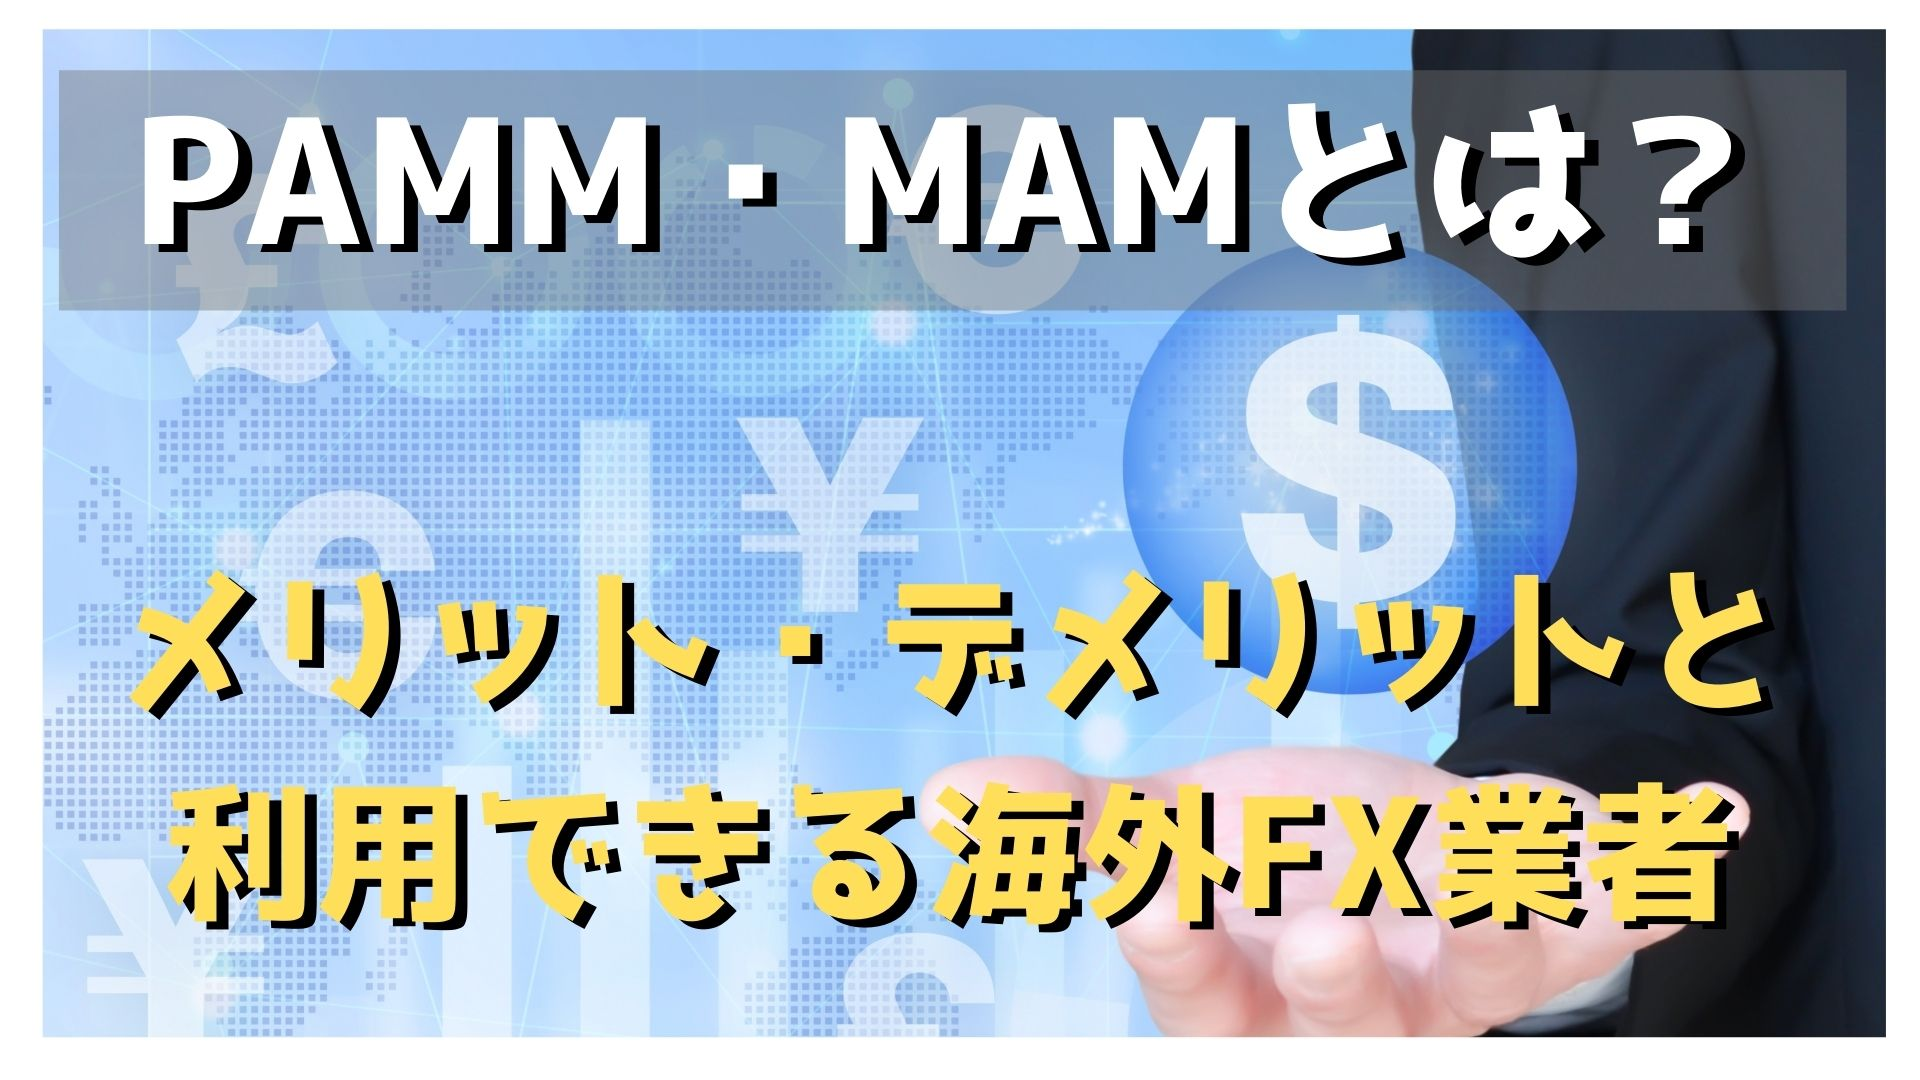 PAMM口座とMAM口座とは?メリット・デメリットと利用できる海外FX業者